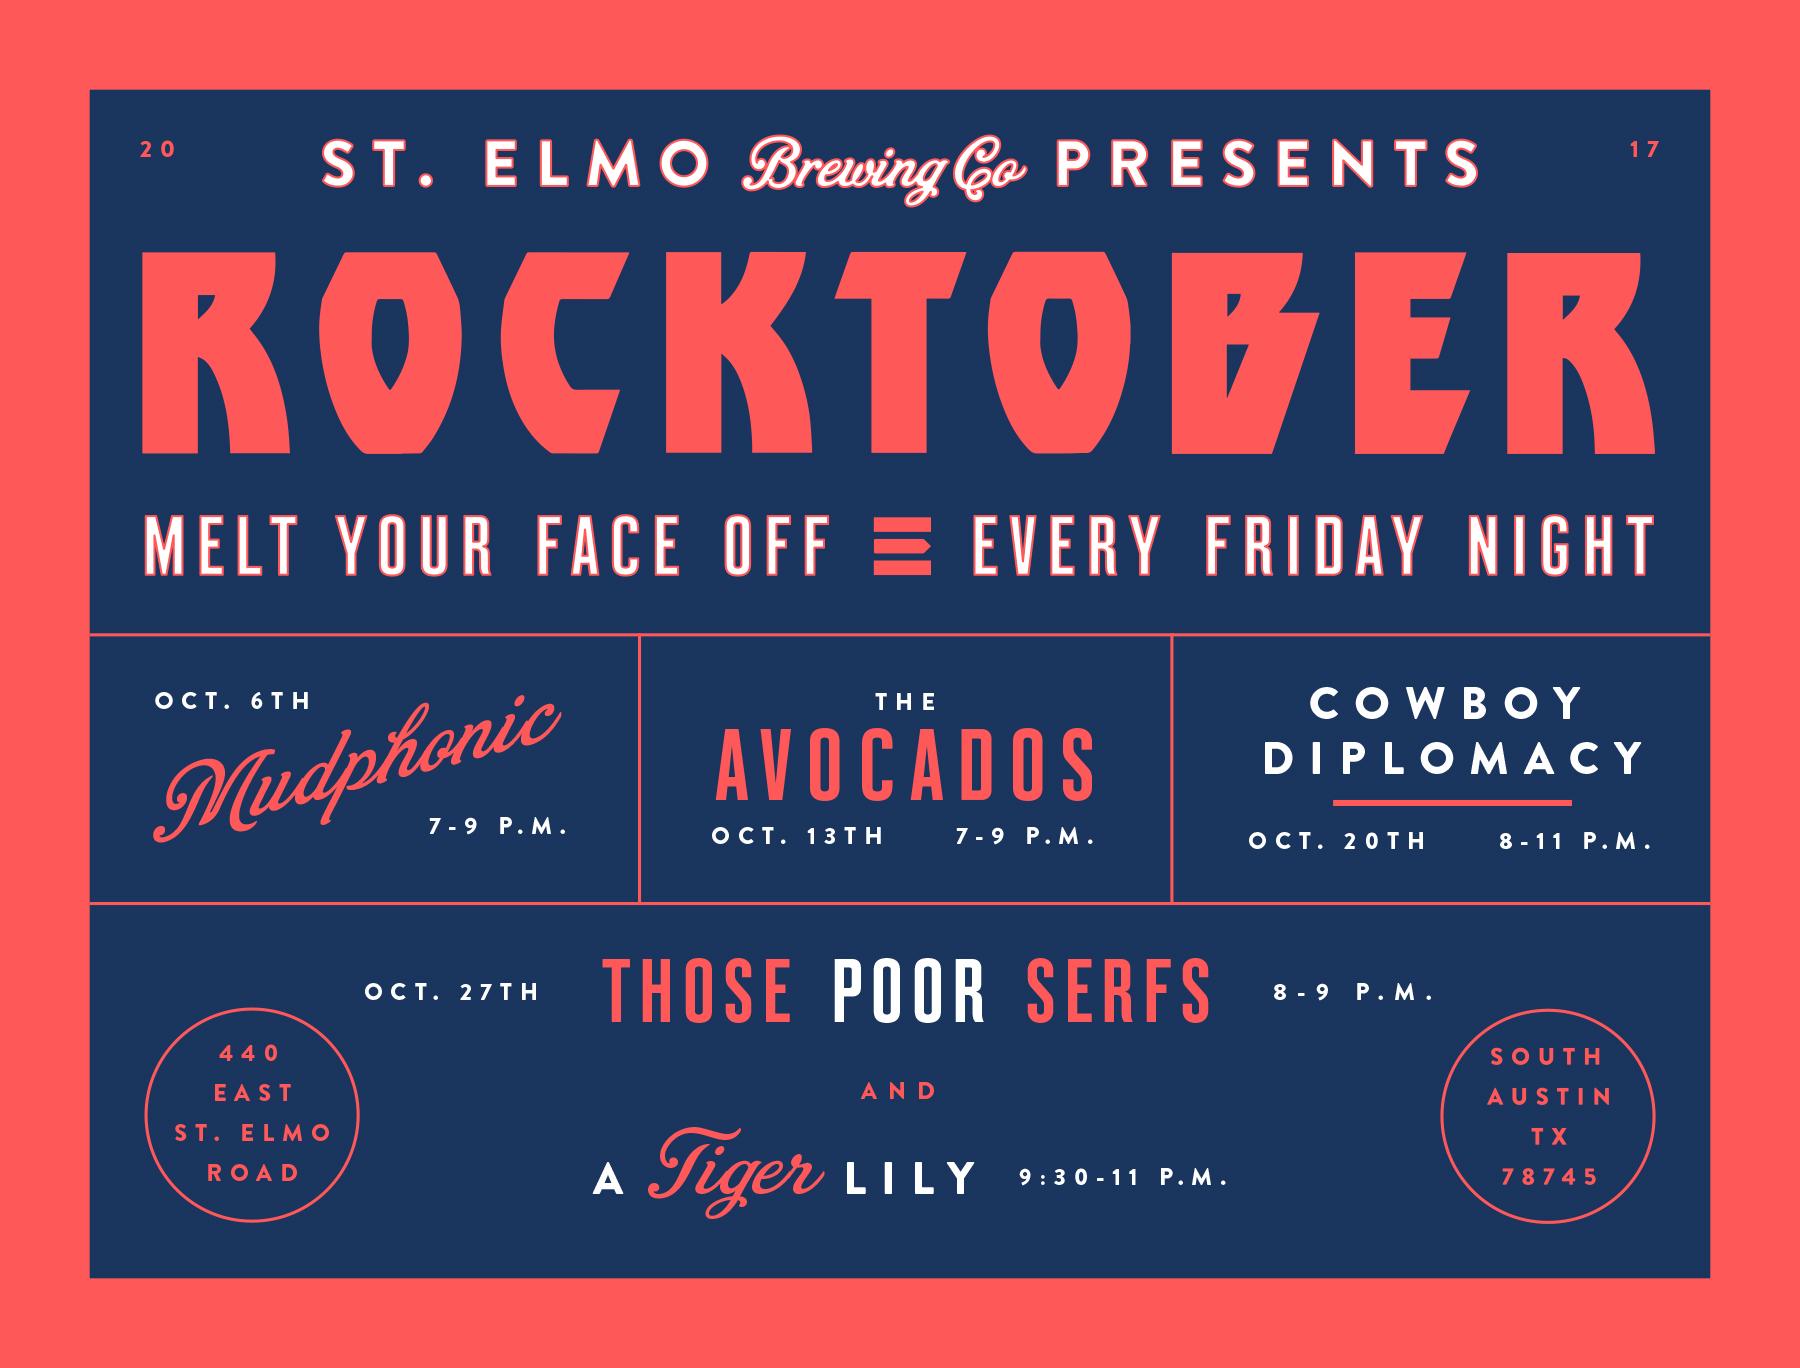 St. elmo rocktober poster